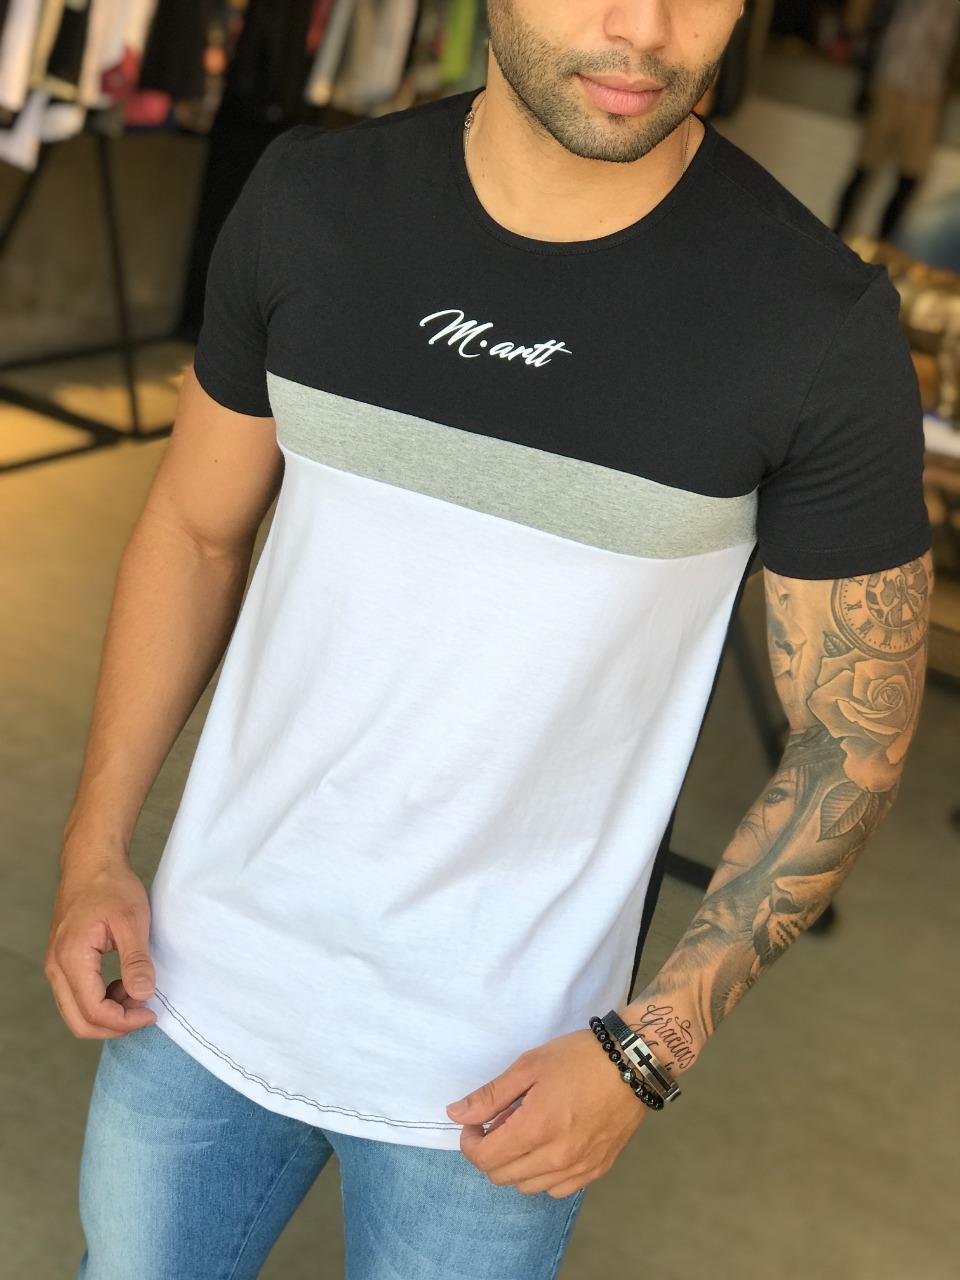 Camiseta M Artt Dual Branca e Preta Faixa Cinza   - Harpia Moda - Moda Masculina & Acessórios